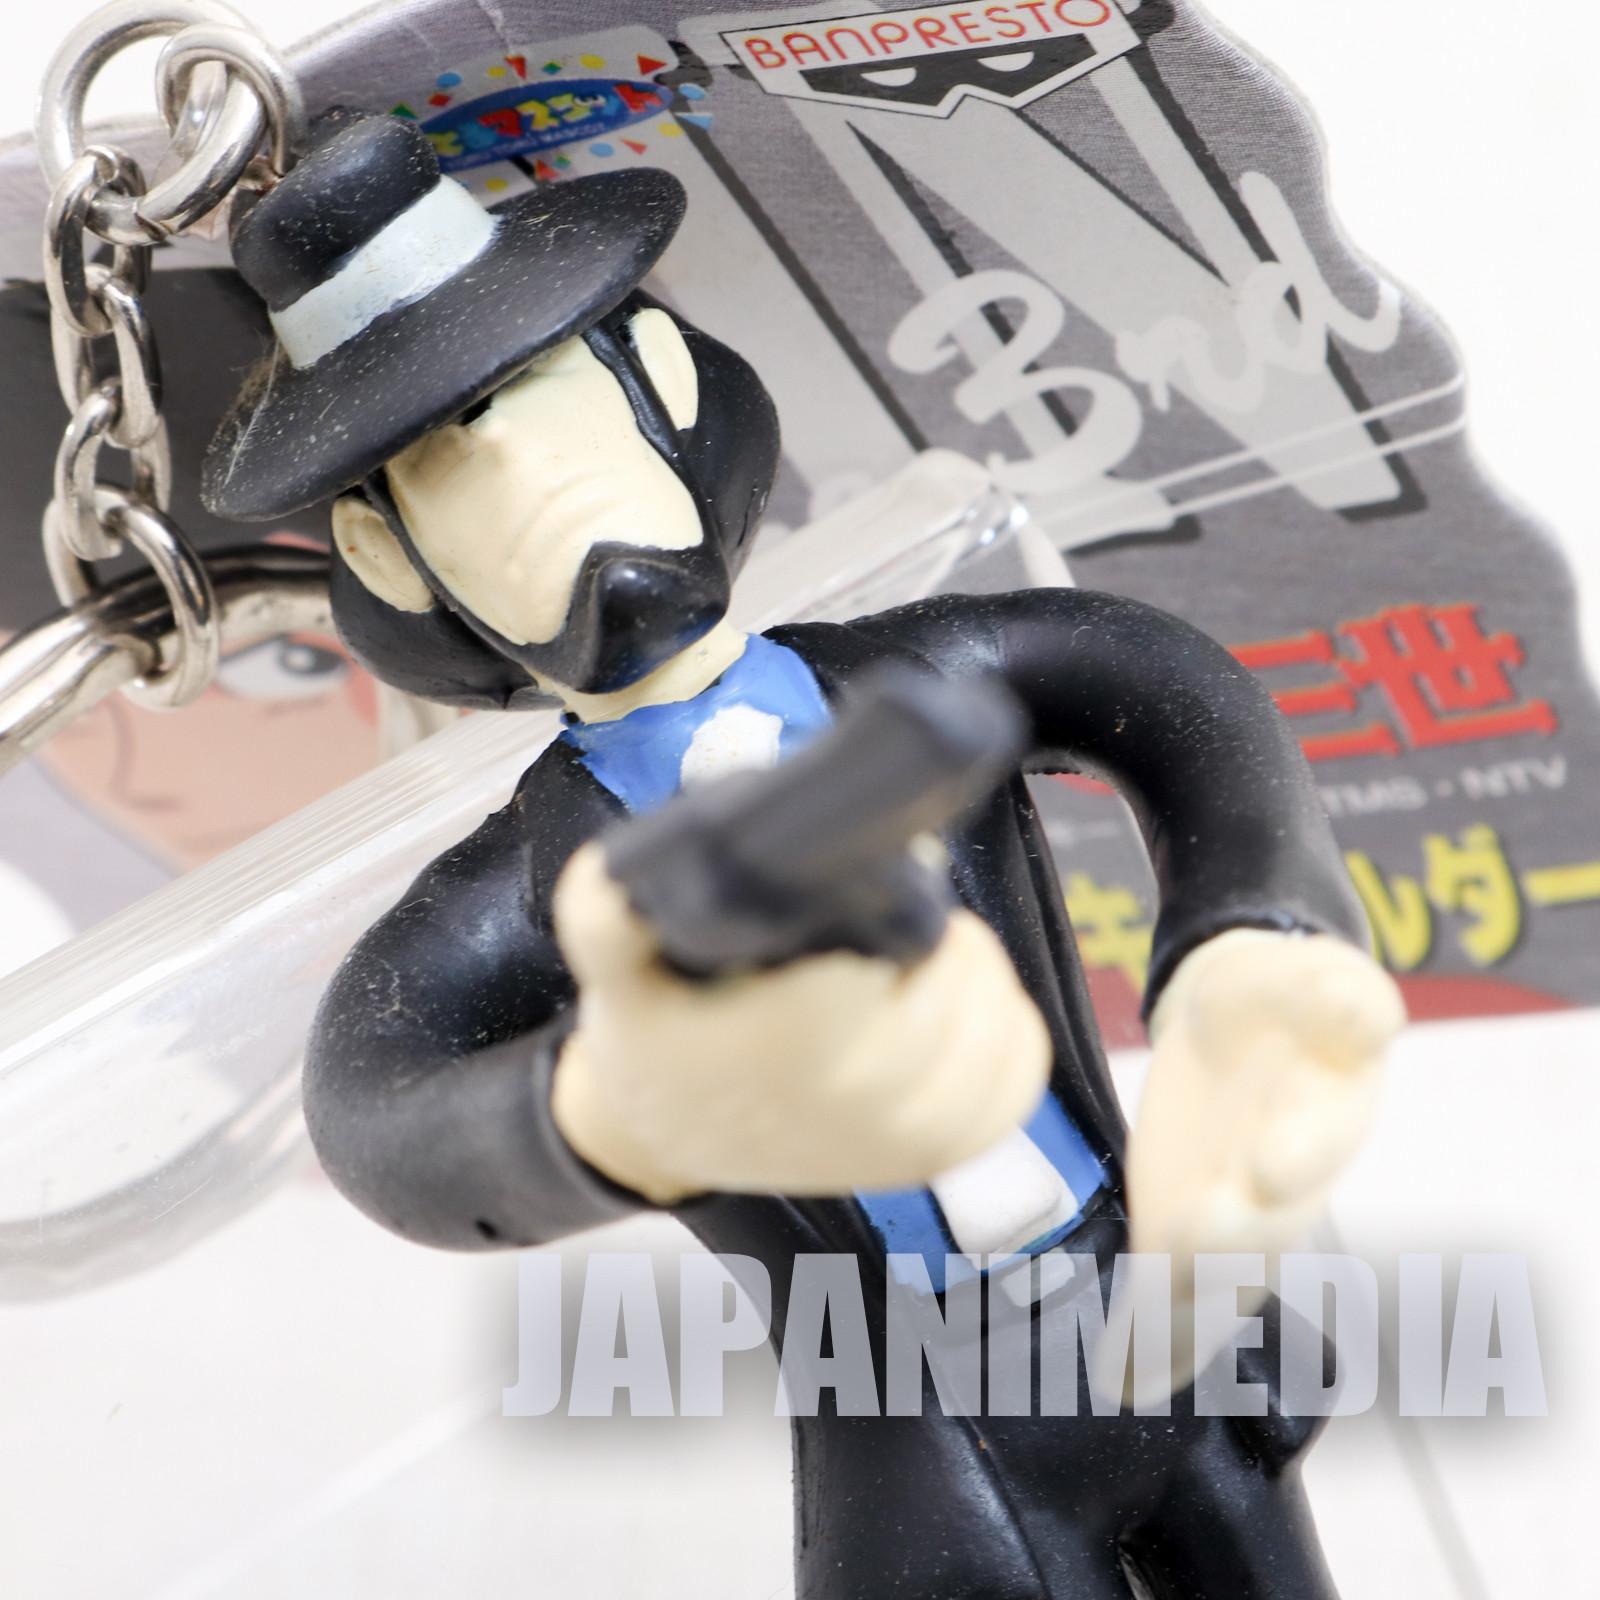 Lupin the Third (3rd) Daisuke Jigen Bendable Figure Keychain JAPAN ANIME MANGA